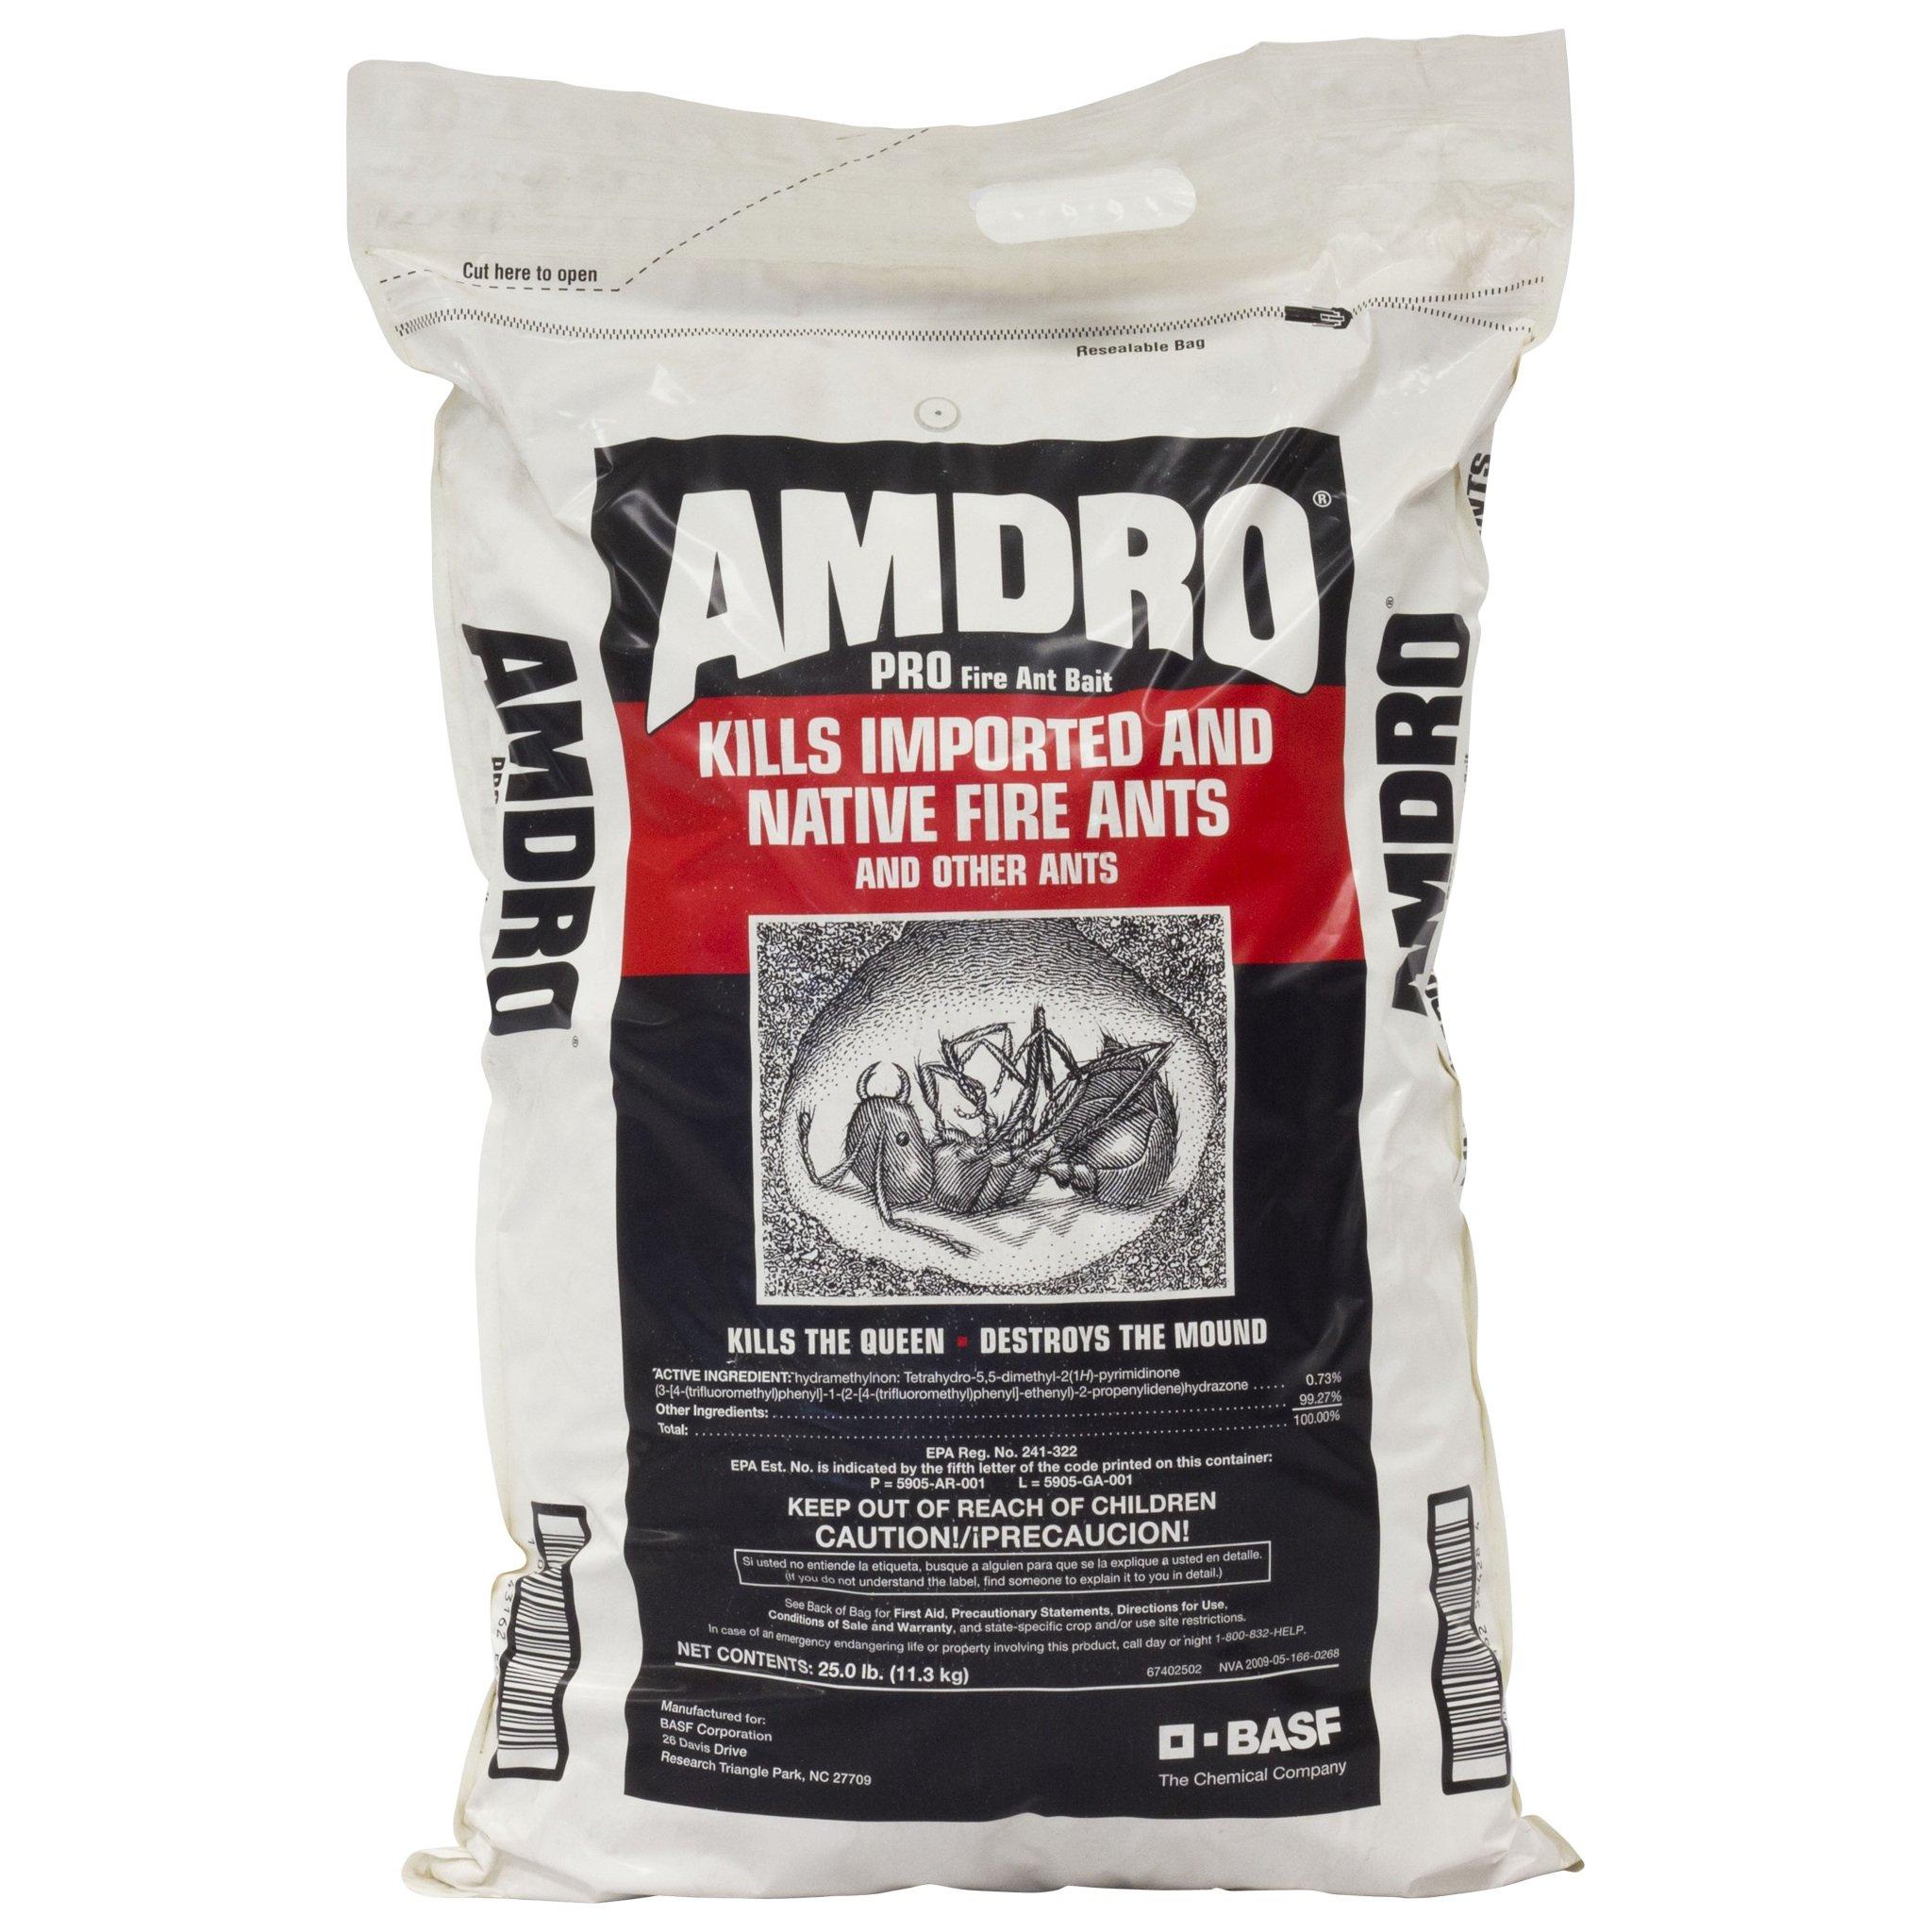 Amdro Pro Fire Ant Bait - 25 Pound Bag